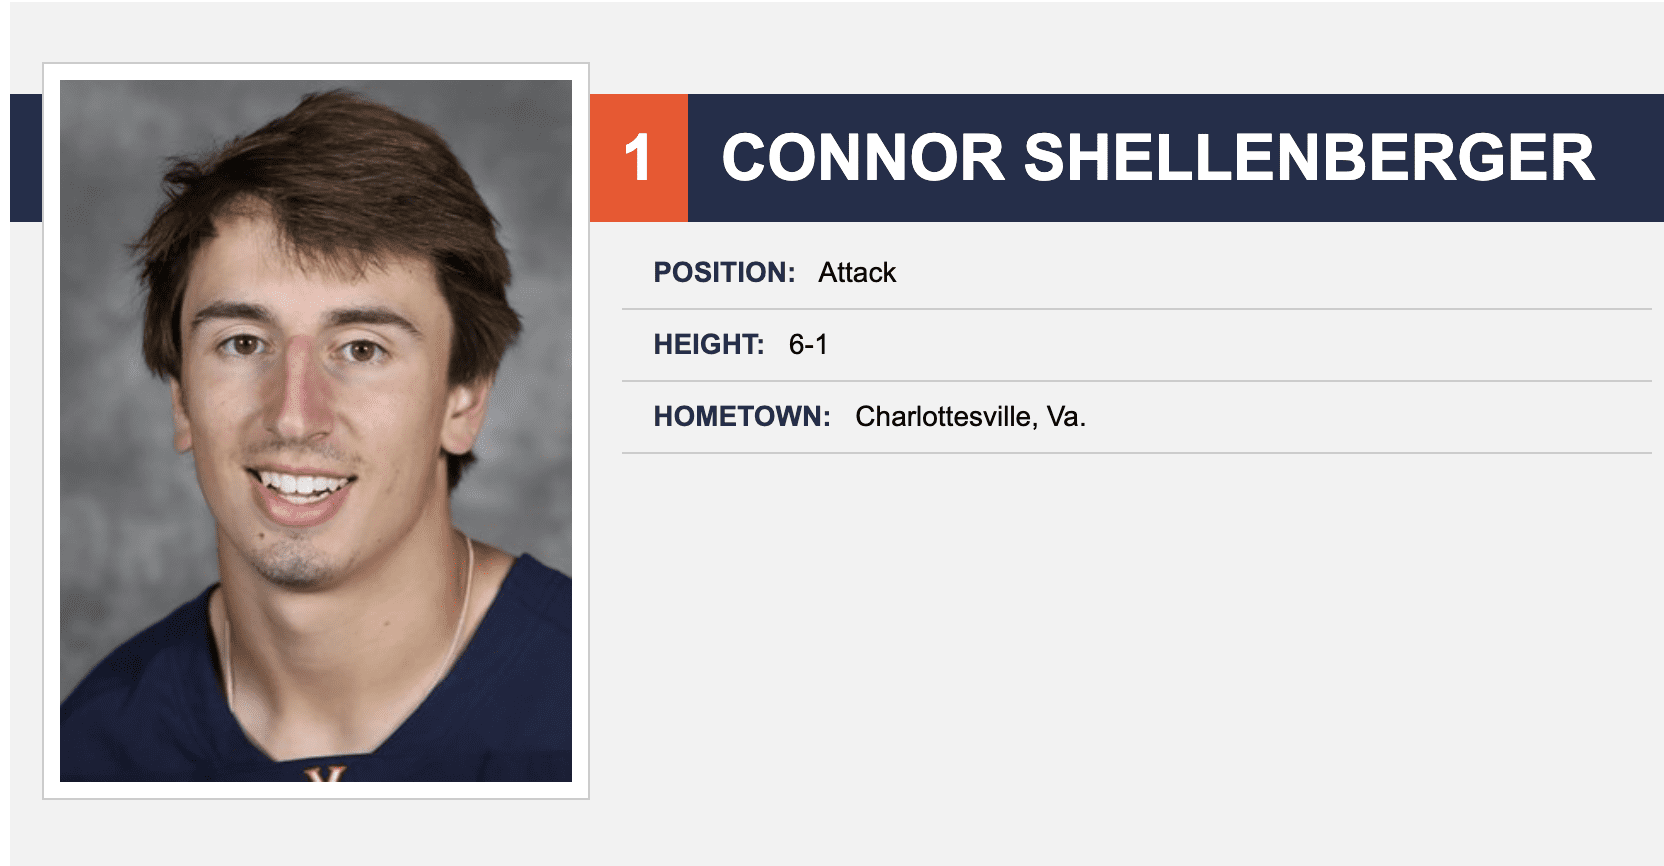 Connor Shellenberger